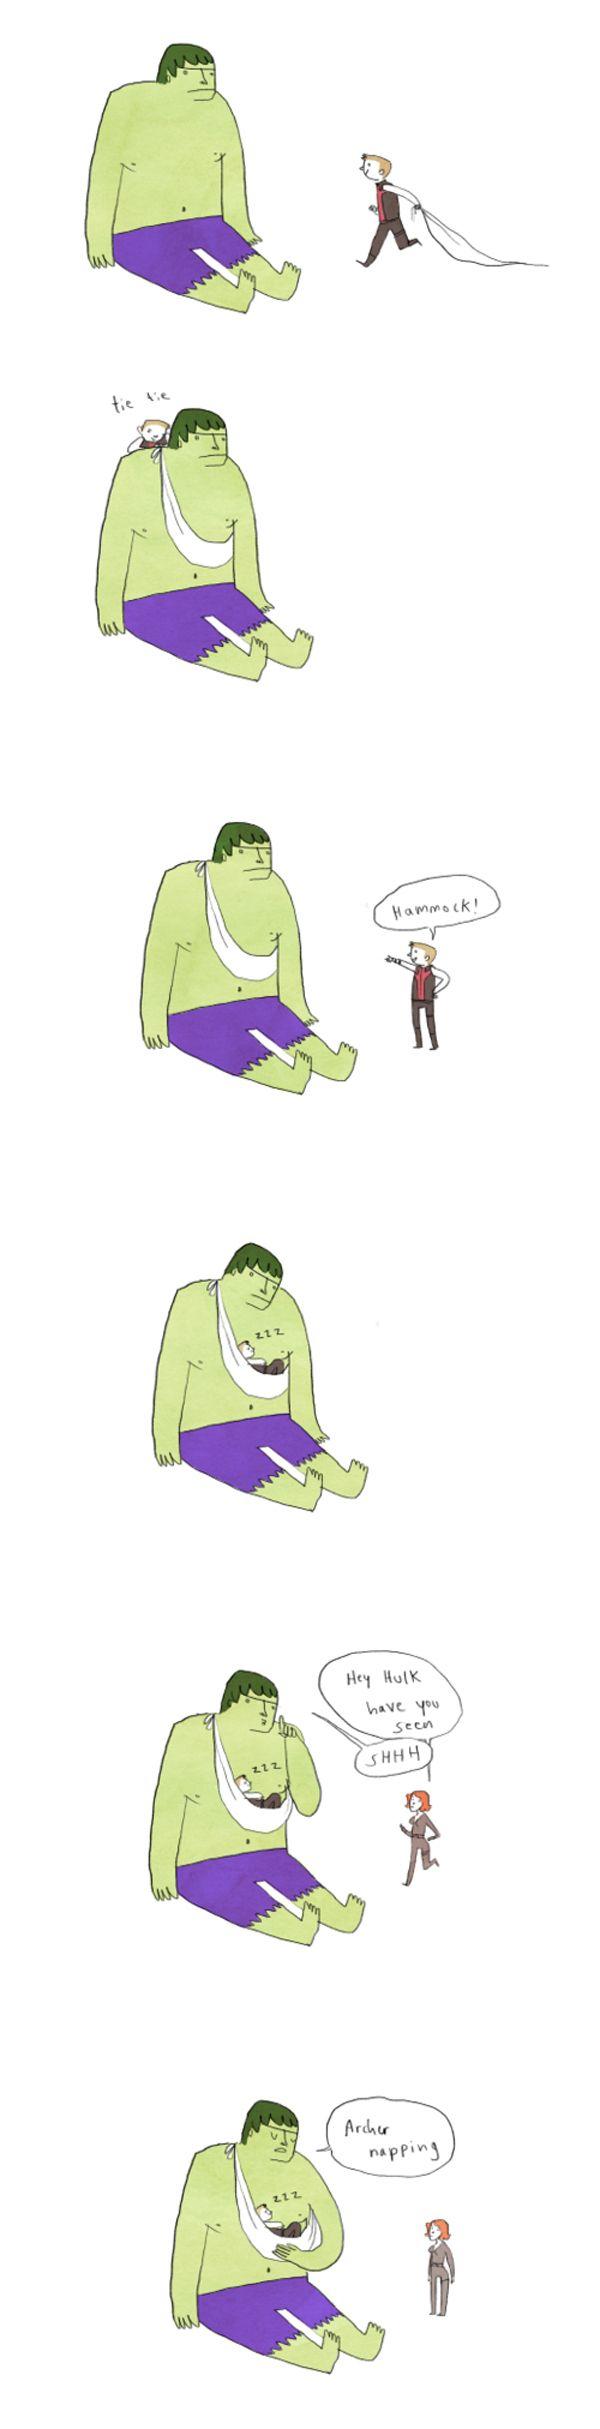 Found on gingerhaze.tumblr.com | http://gingerhaze.tumblr.com/post/22012297333/large-size-have-a-shmoopy-hulkeye-comic-because